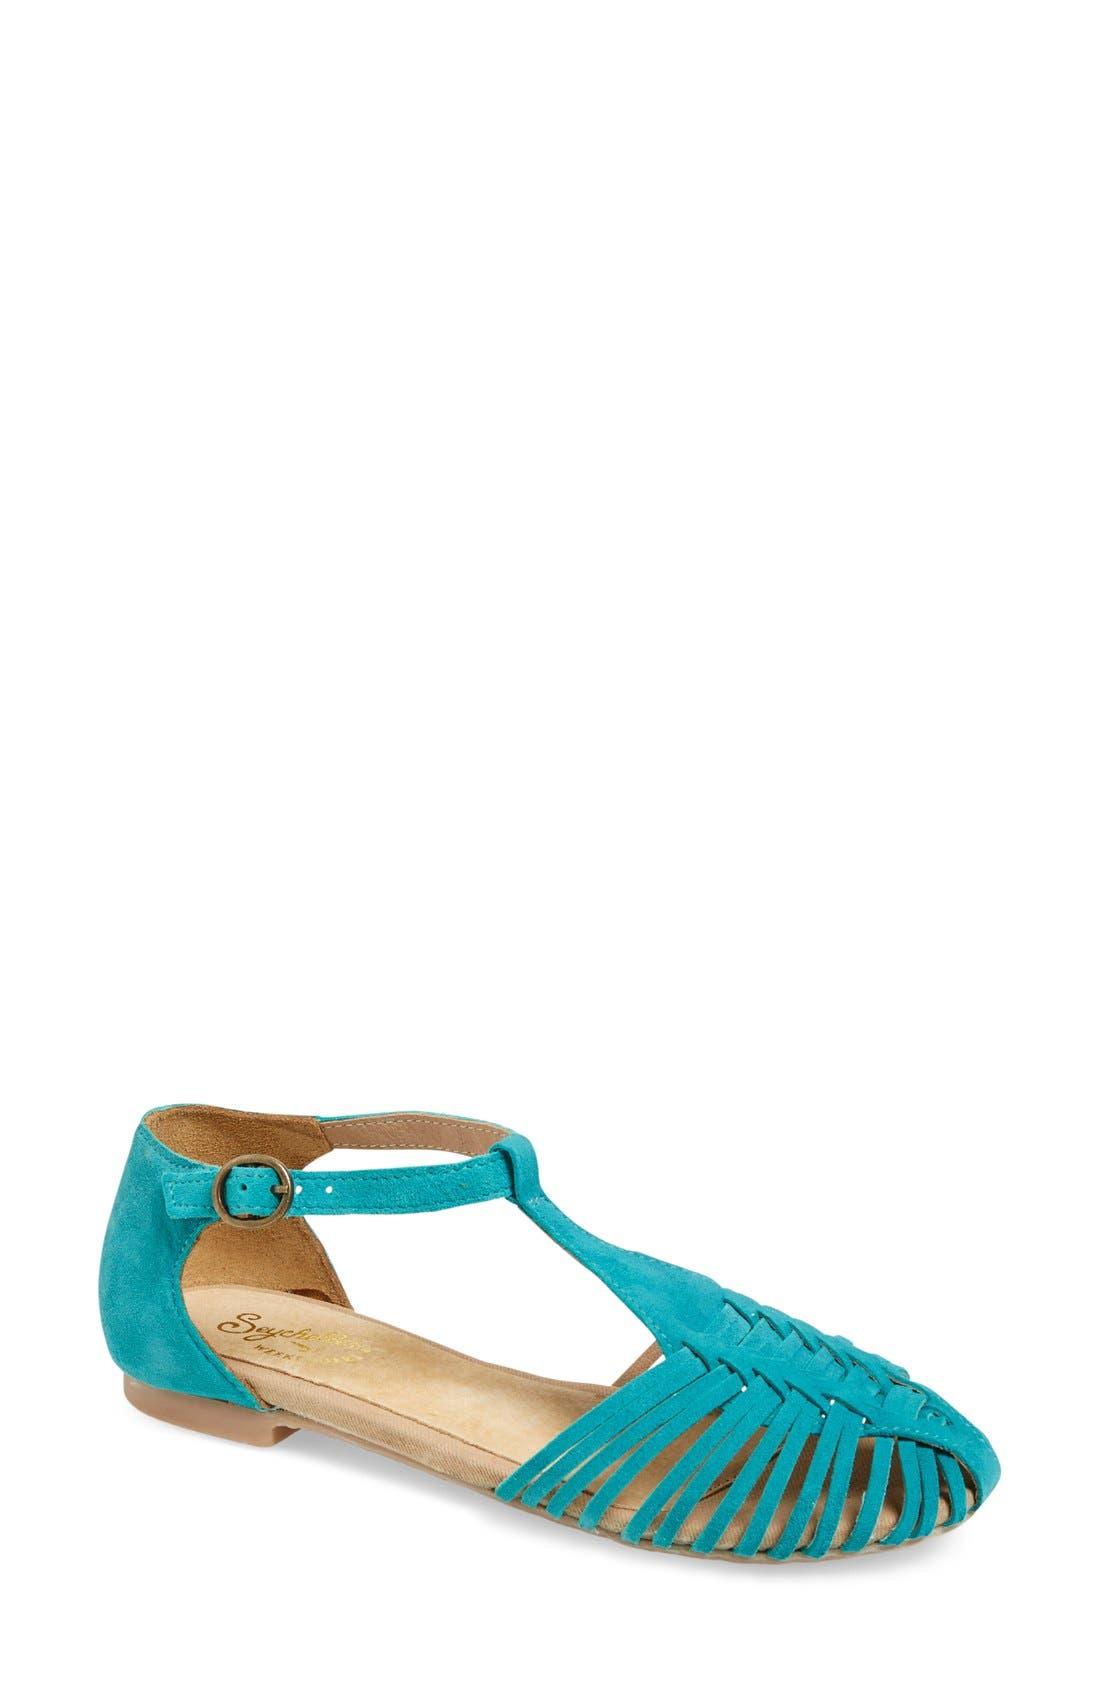 Alternate Image 1 Selected - Seychelles 'Into Thin Air' Leather Huarache Flat Sandal (Women)